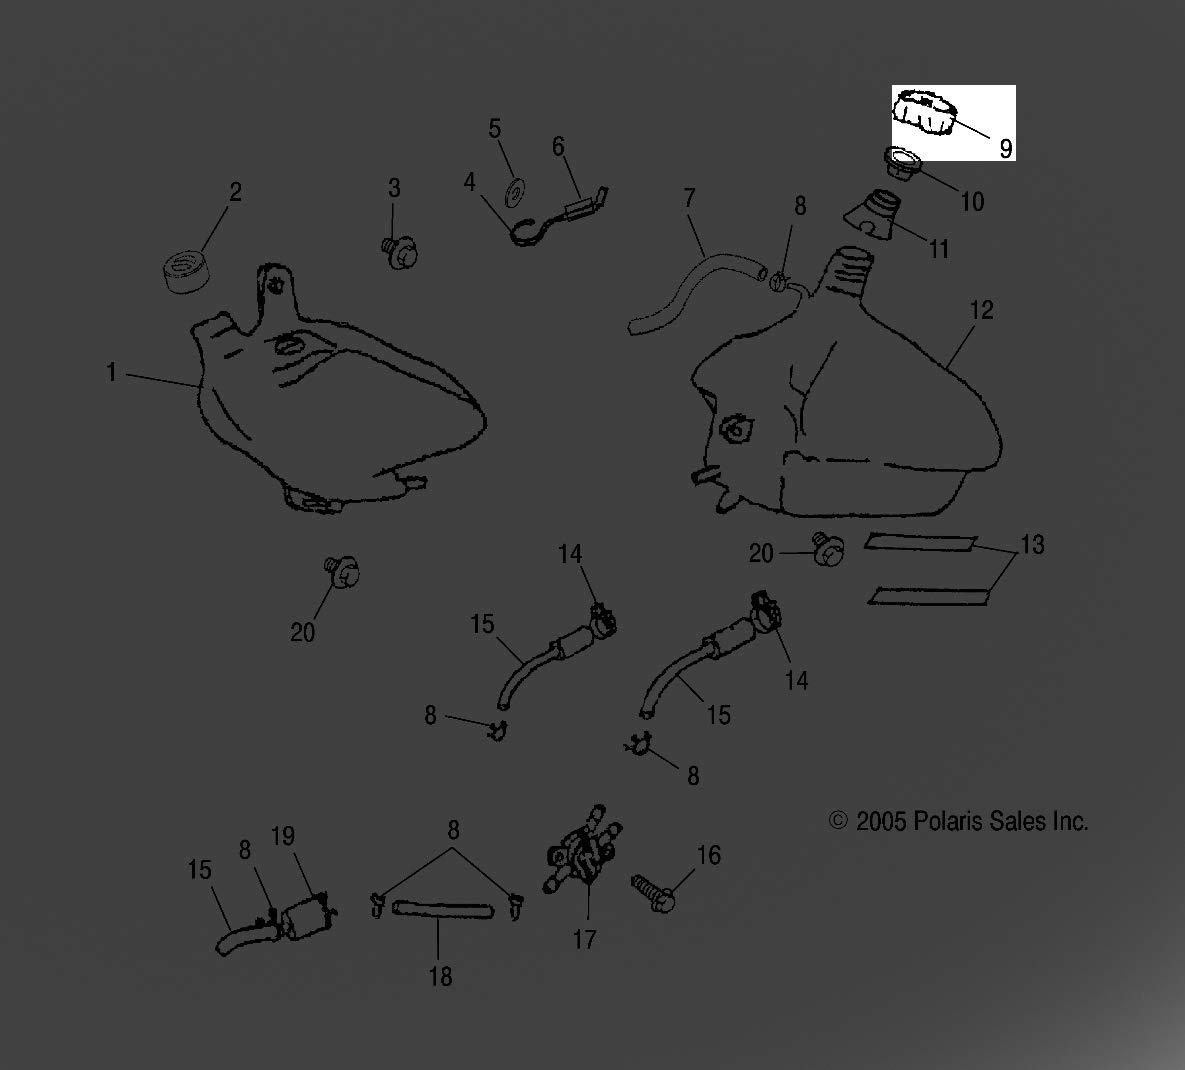 wiring diagram 2006 polaris sportsman 90 amazon com fuel tank cap scrambler50 90 2003 predator 90 2003  amazon com fuel tank cap scrambler50